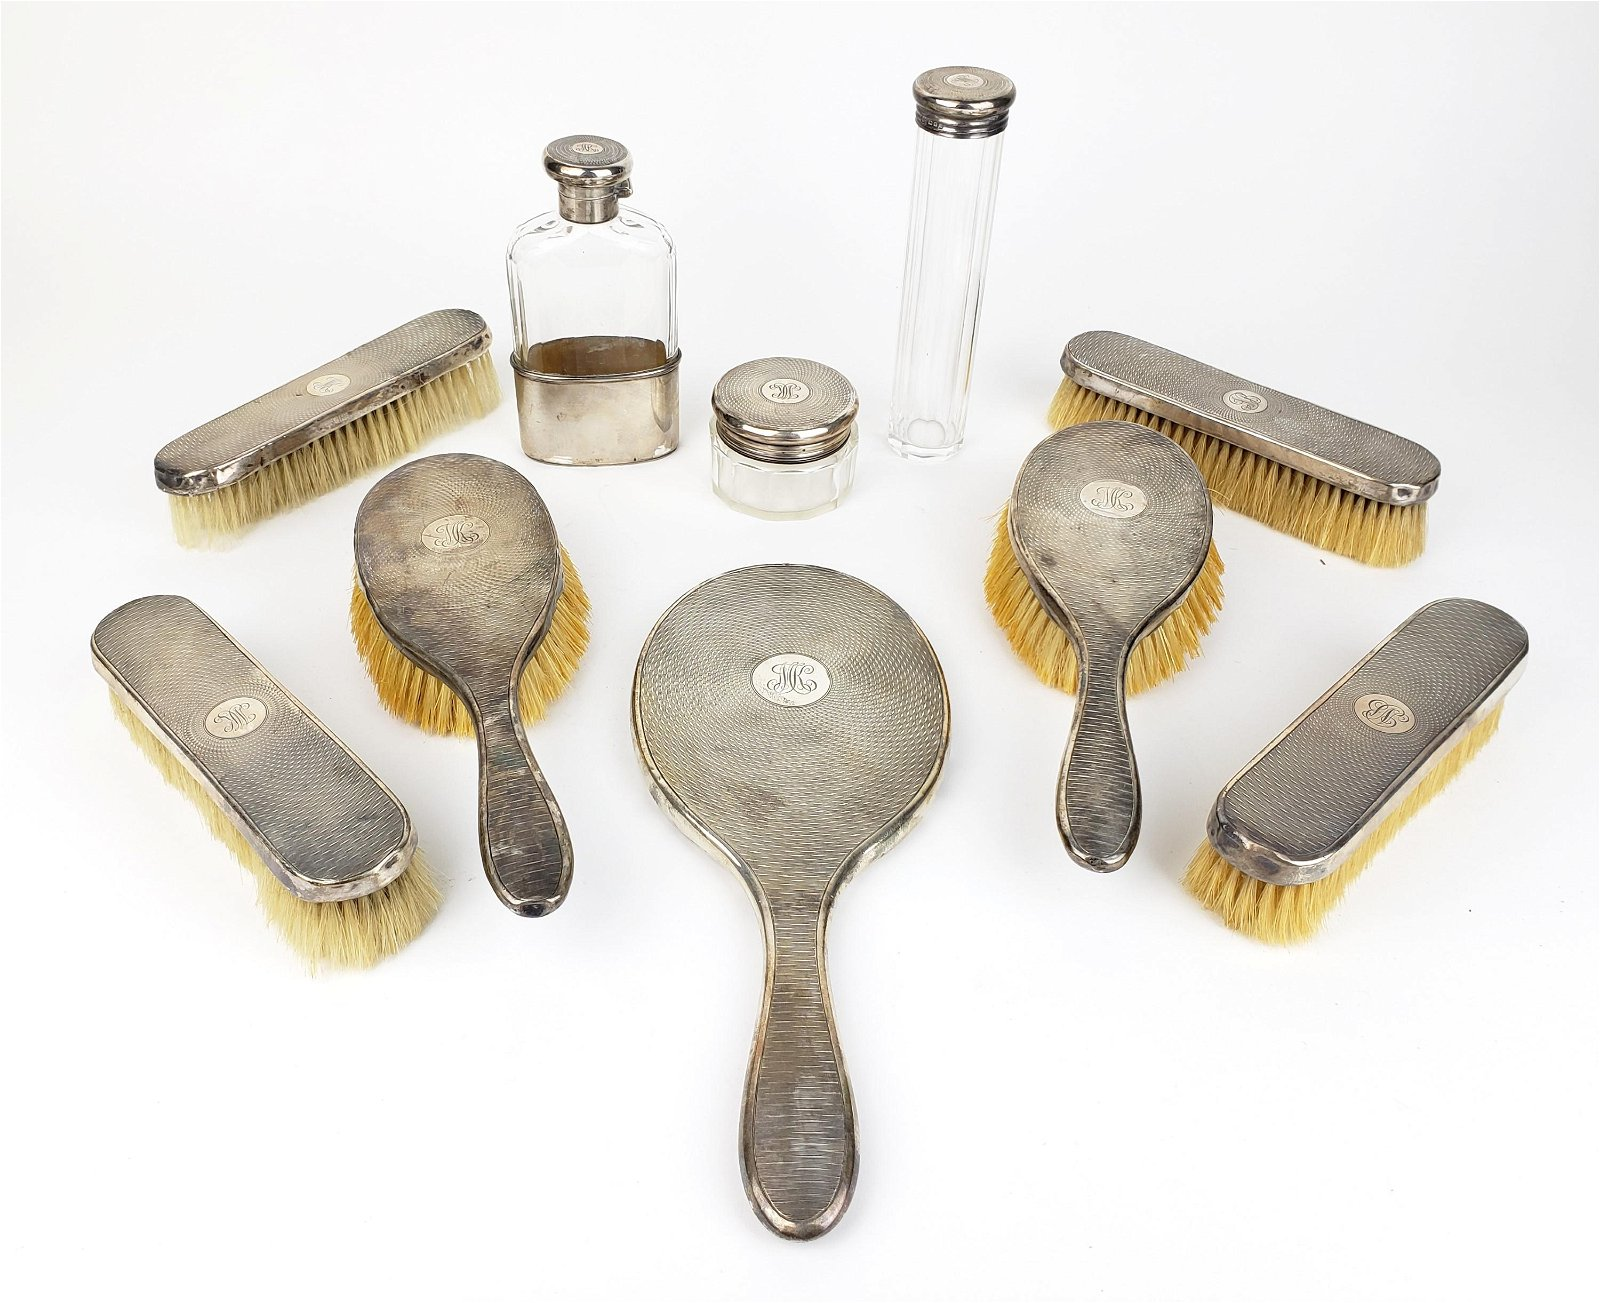 10 Pc. Sterling Silver & Glass Salon Set